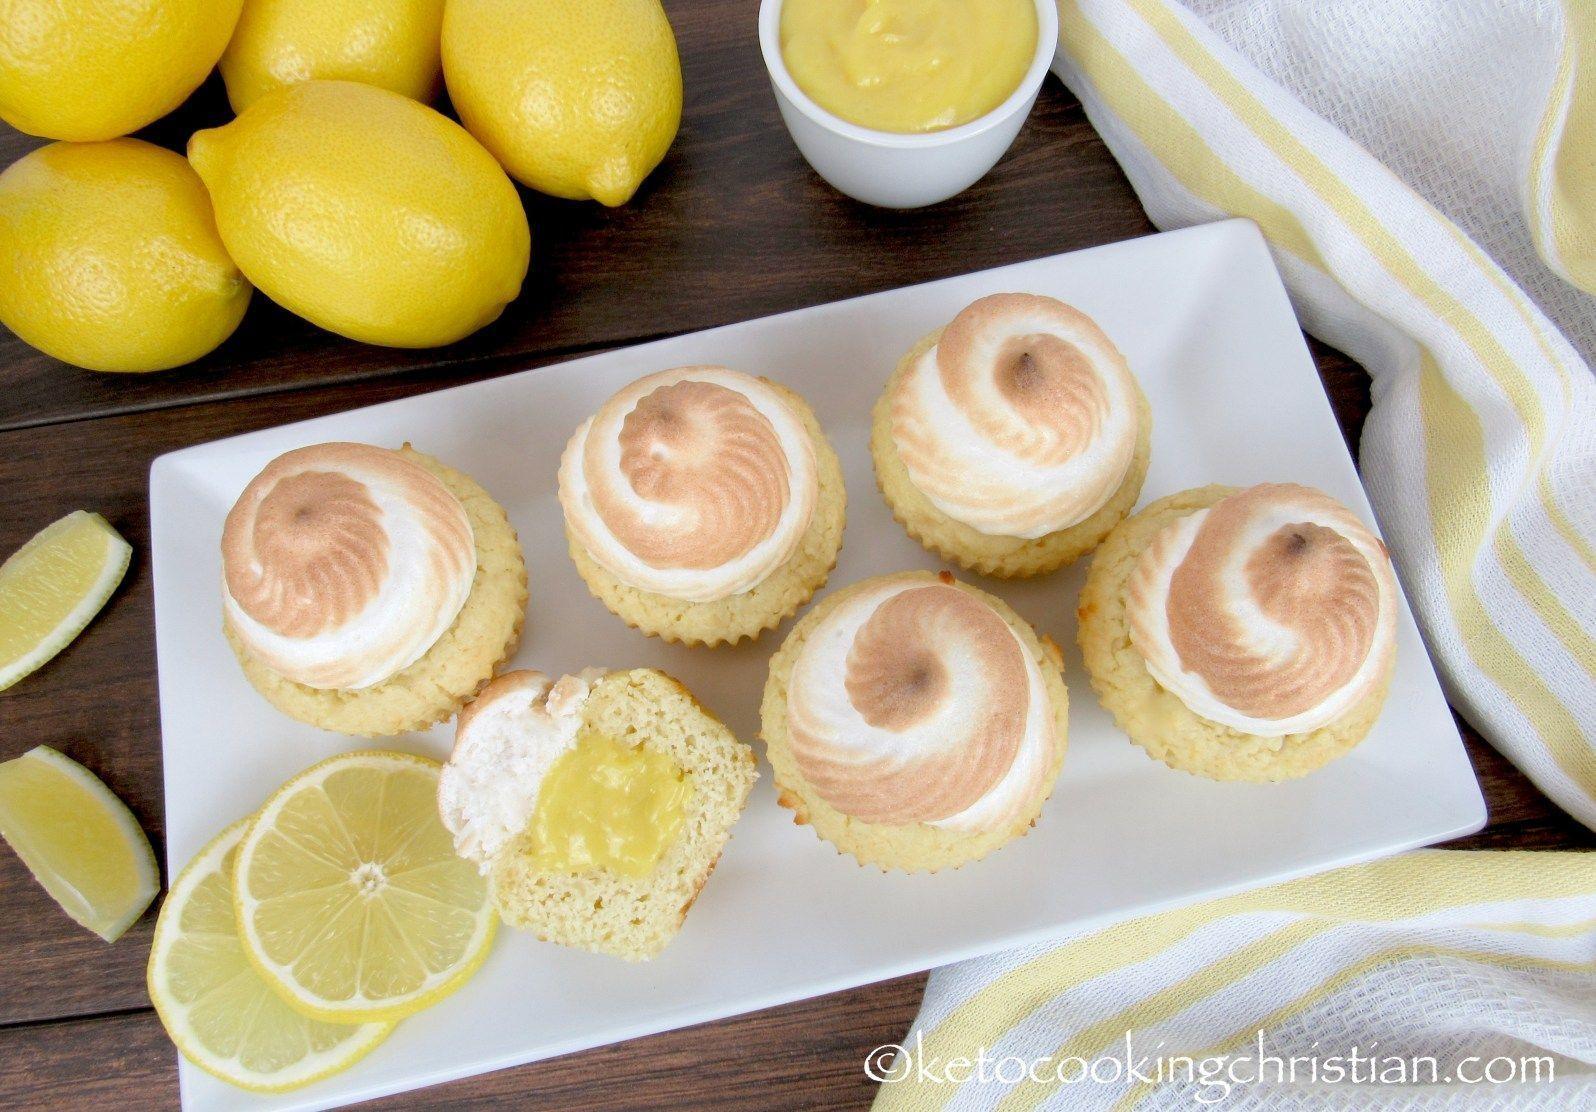 Lemon Meringue Cupcakes - Keto, Low Carb & Gluten Free #apfelcupcakes Lemon Meringue Cupcakes - Keto, Low Carb & Gluten Free #lemonmeringuecupcakes Lemon Meringue Cupcakes - Keto, Low Carb & Gluten Free #apfelcupcakes Lemon Meringue Cupcakes - Keto, Low Carb & Gluten Free #lemonmeringuecupcakes Lemon Meringue Cupcakes - Keto, Low Carb & Gluten Free #apfelcupcakes Lemon Meringue Cupcakes - Keto, Low Carb & Gluten Free #lemonmeringuecupcakes Lemon Meringue Cupcakes - Keto, Low Carb & Gluten Free # #lemonmeringuecupcakes